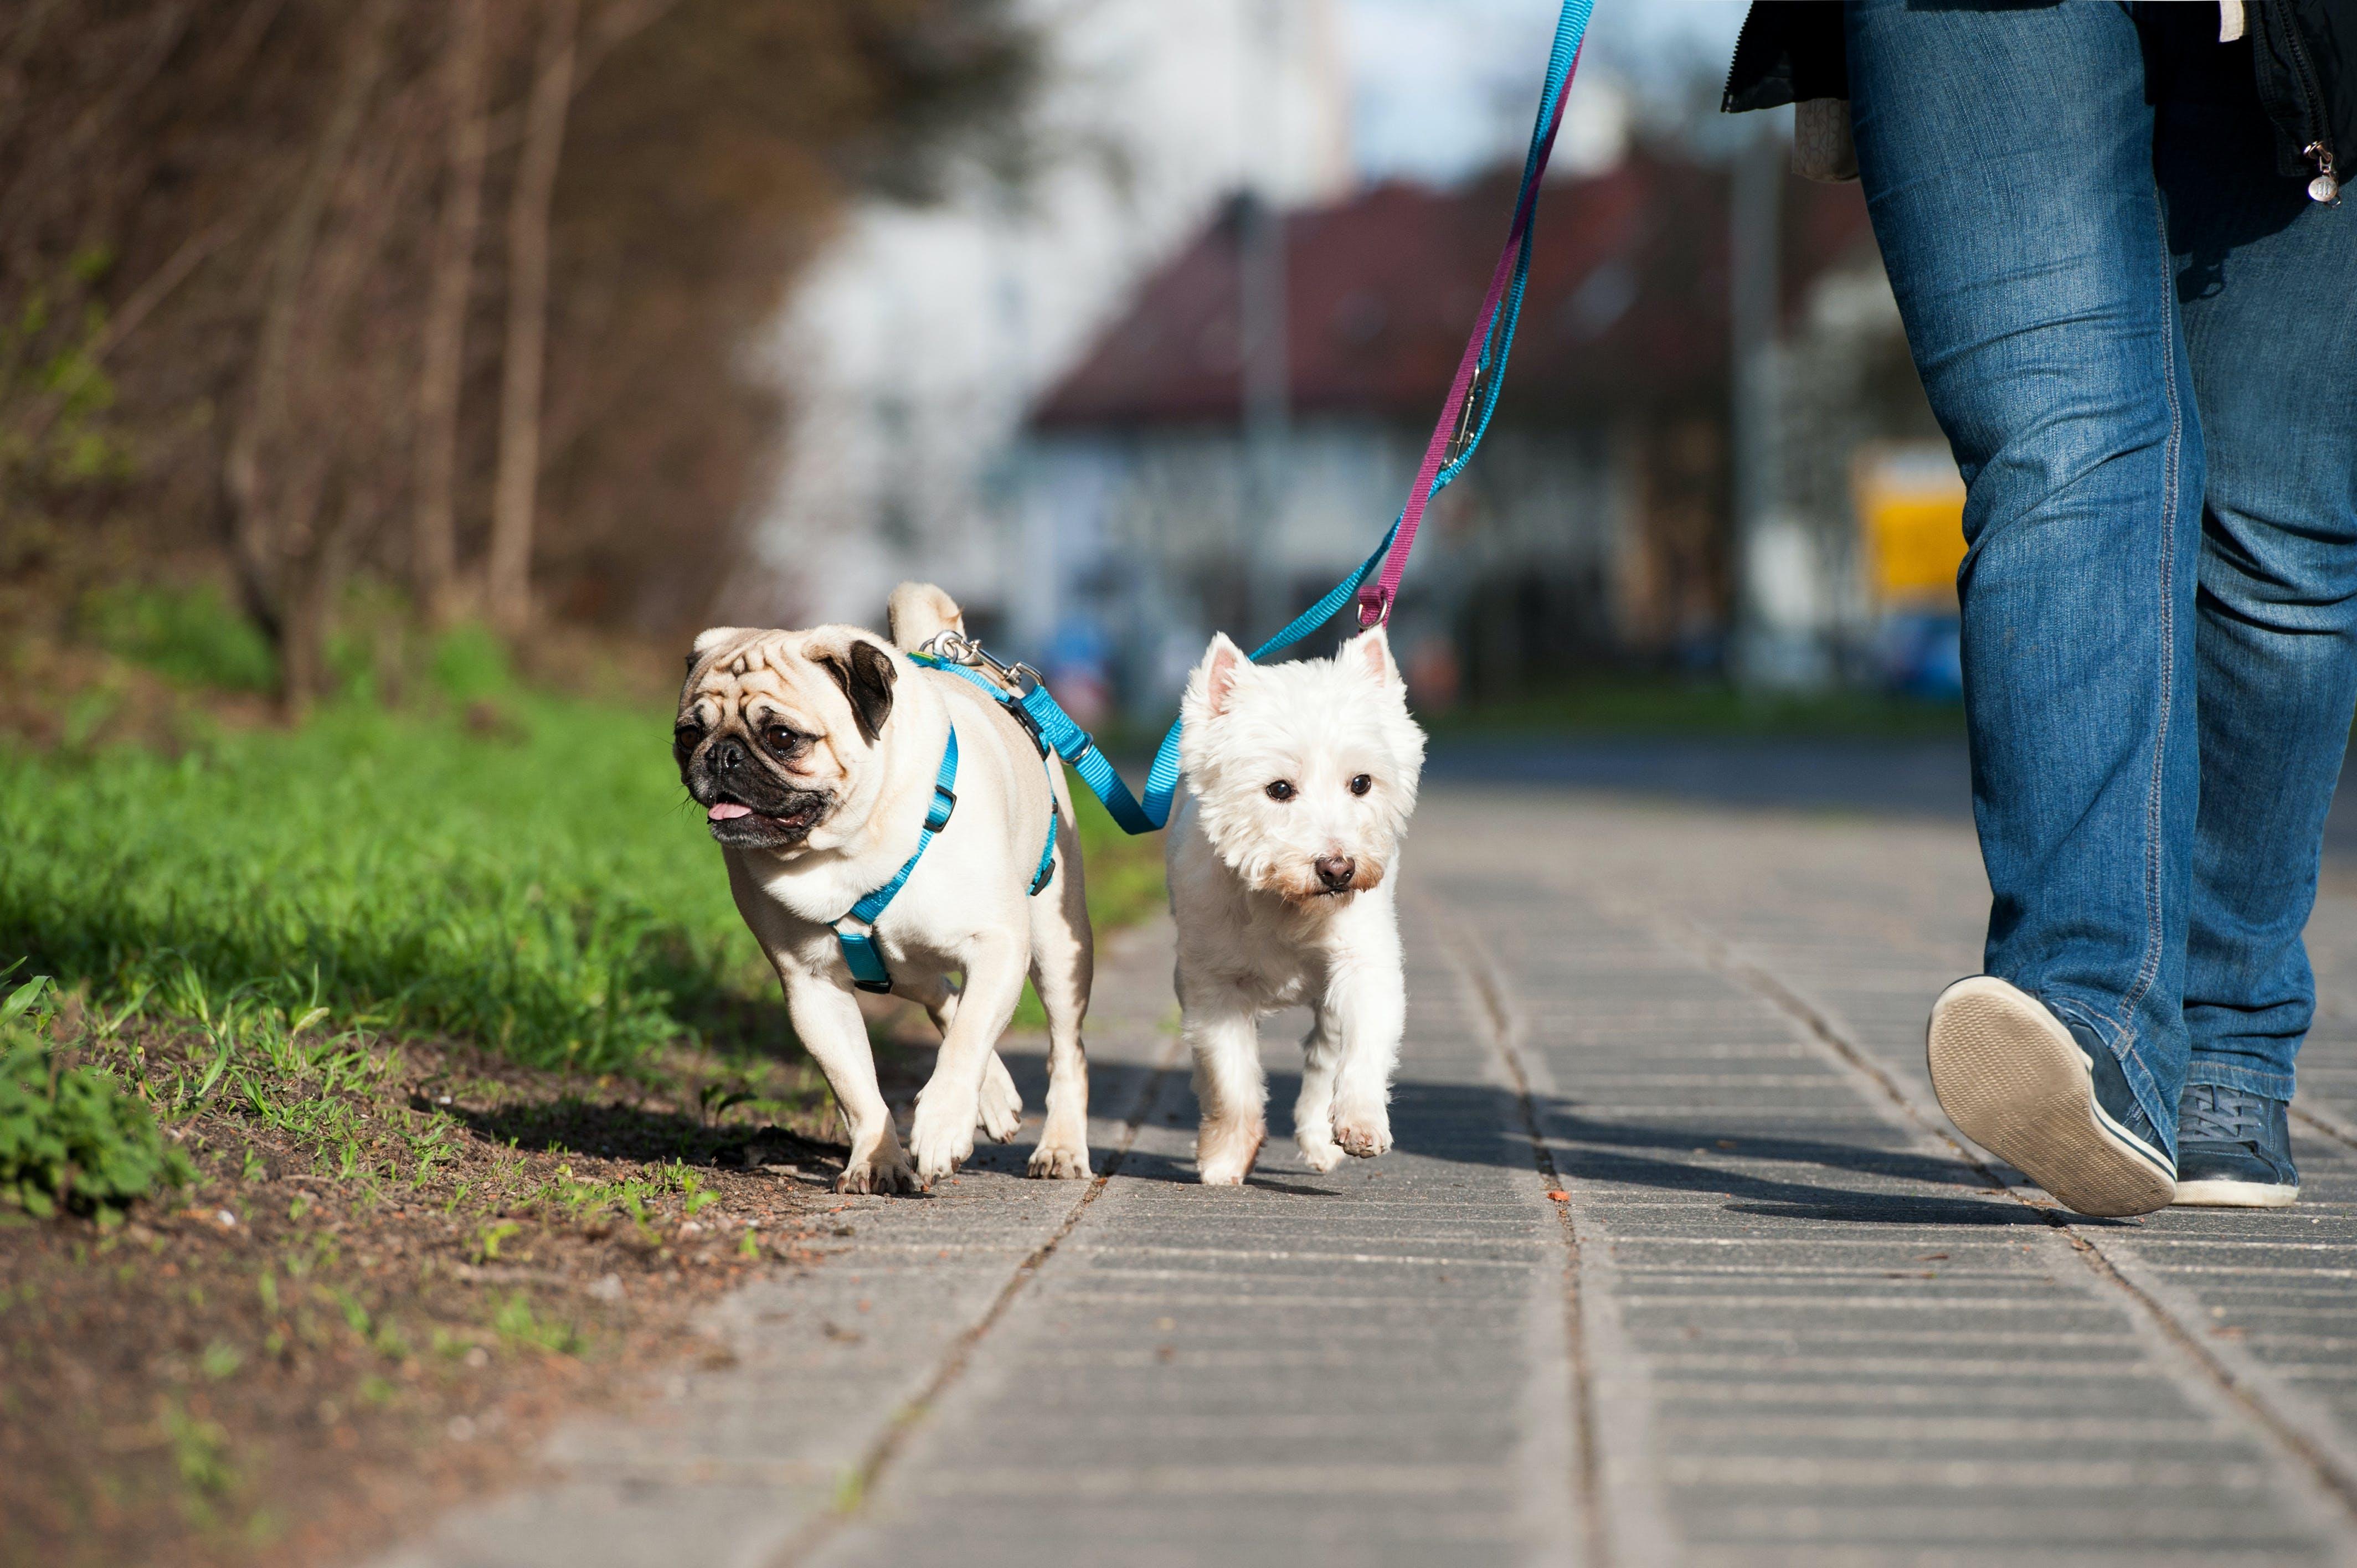 daily-wag-meet-ashley-a-atlanta-wag-dog-walker-spotlight-story-hero-image